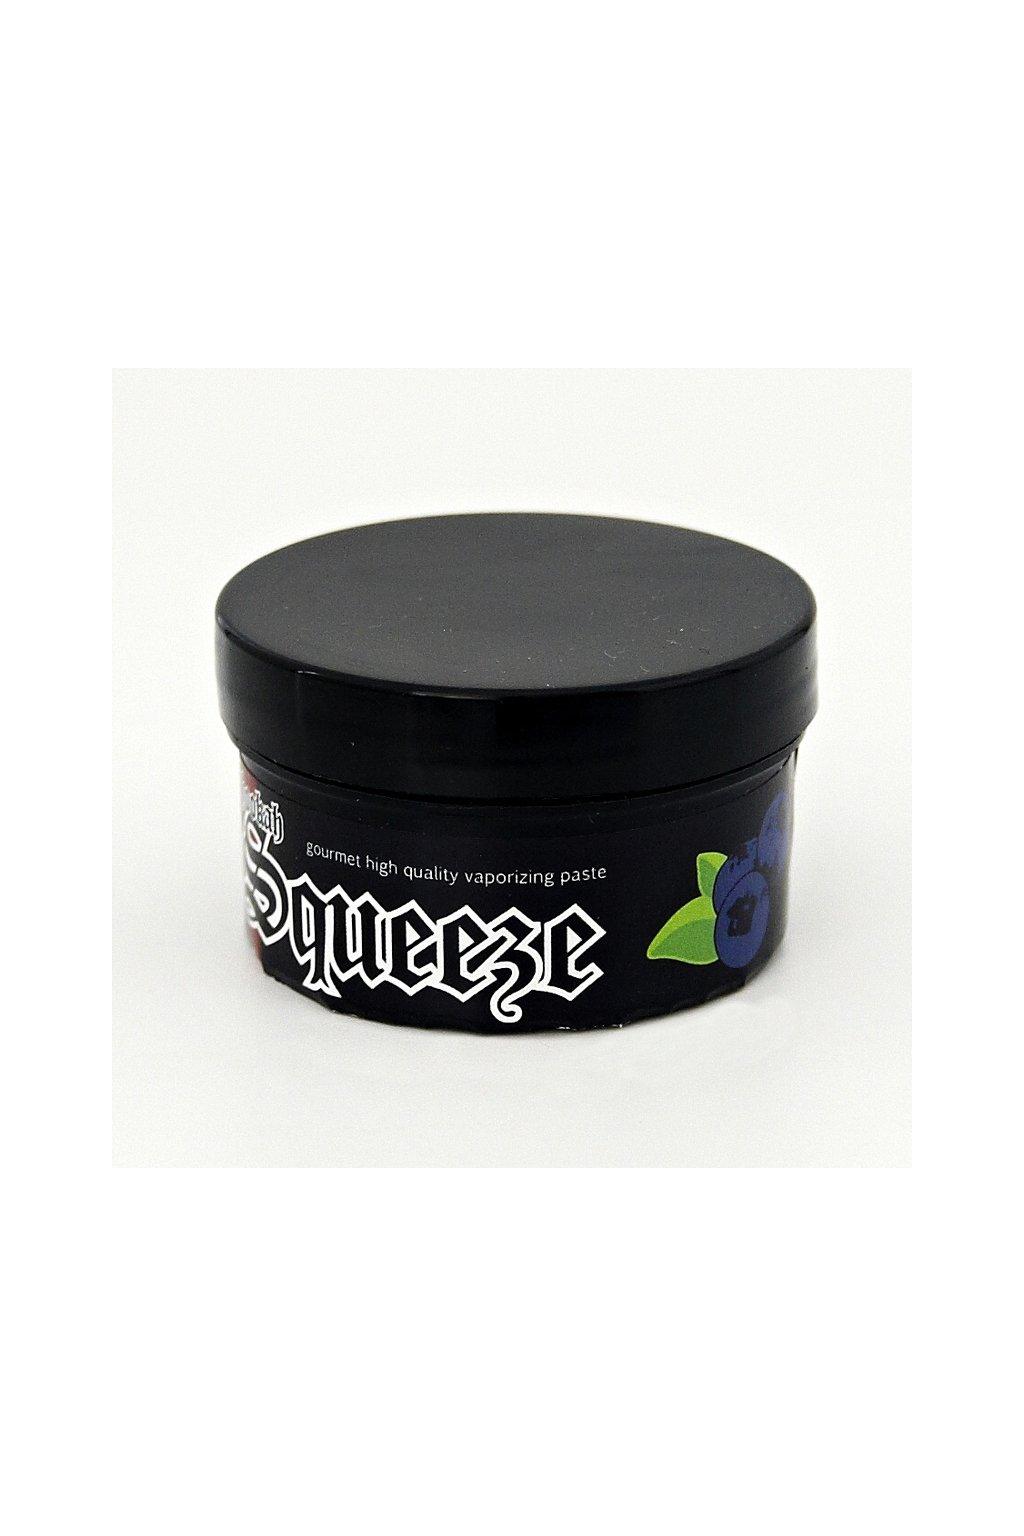 hookahSqueeze Vapor Paste 050 g Blueberry